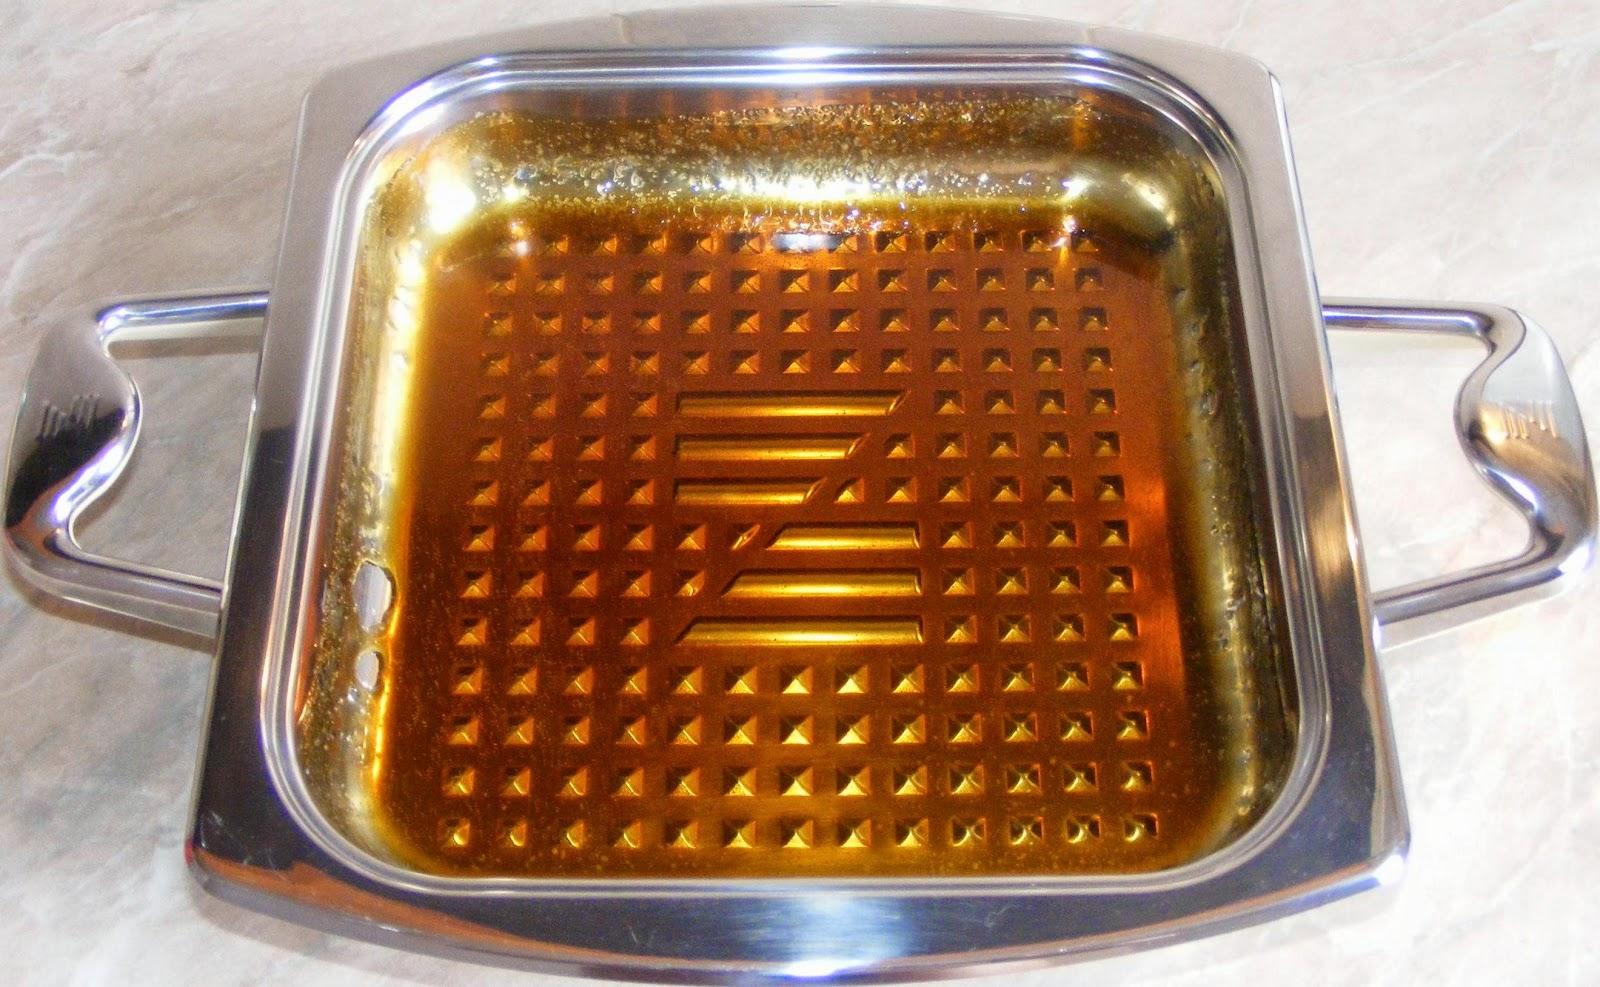 zahar caramelizat, zahar caramelizat pentru tarta si prajituri, retete si preparate culinare cu zahar caramelizat,